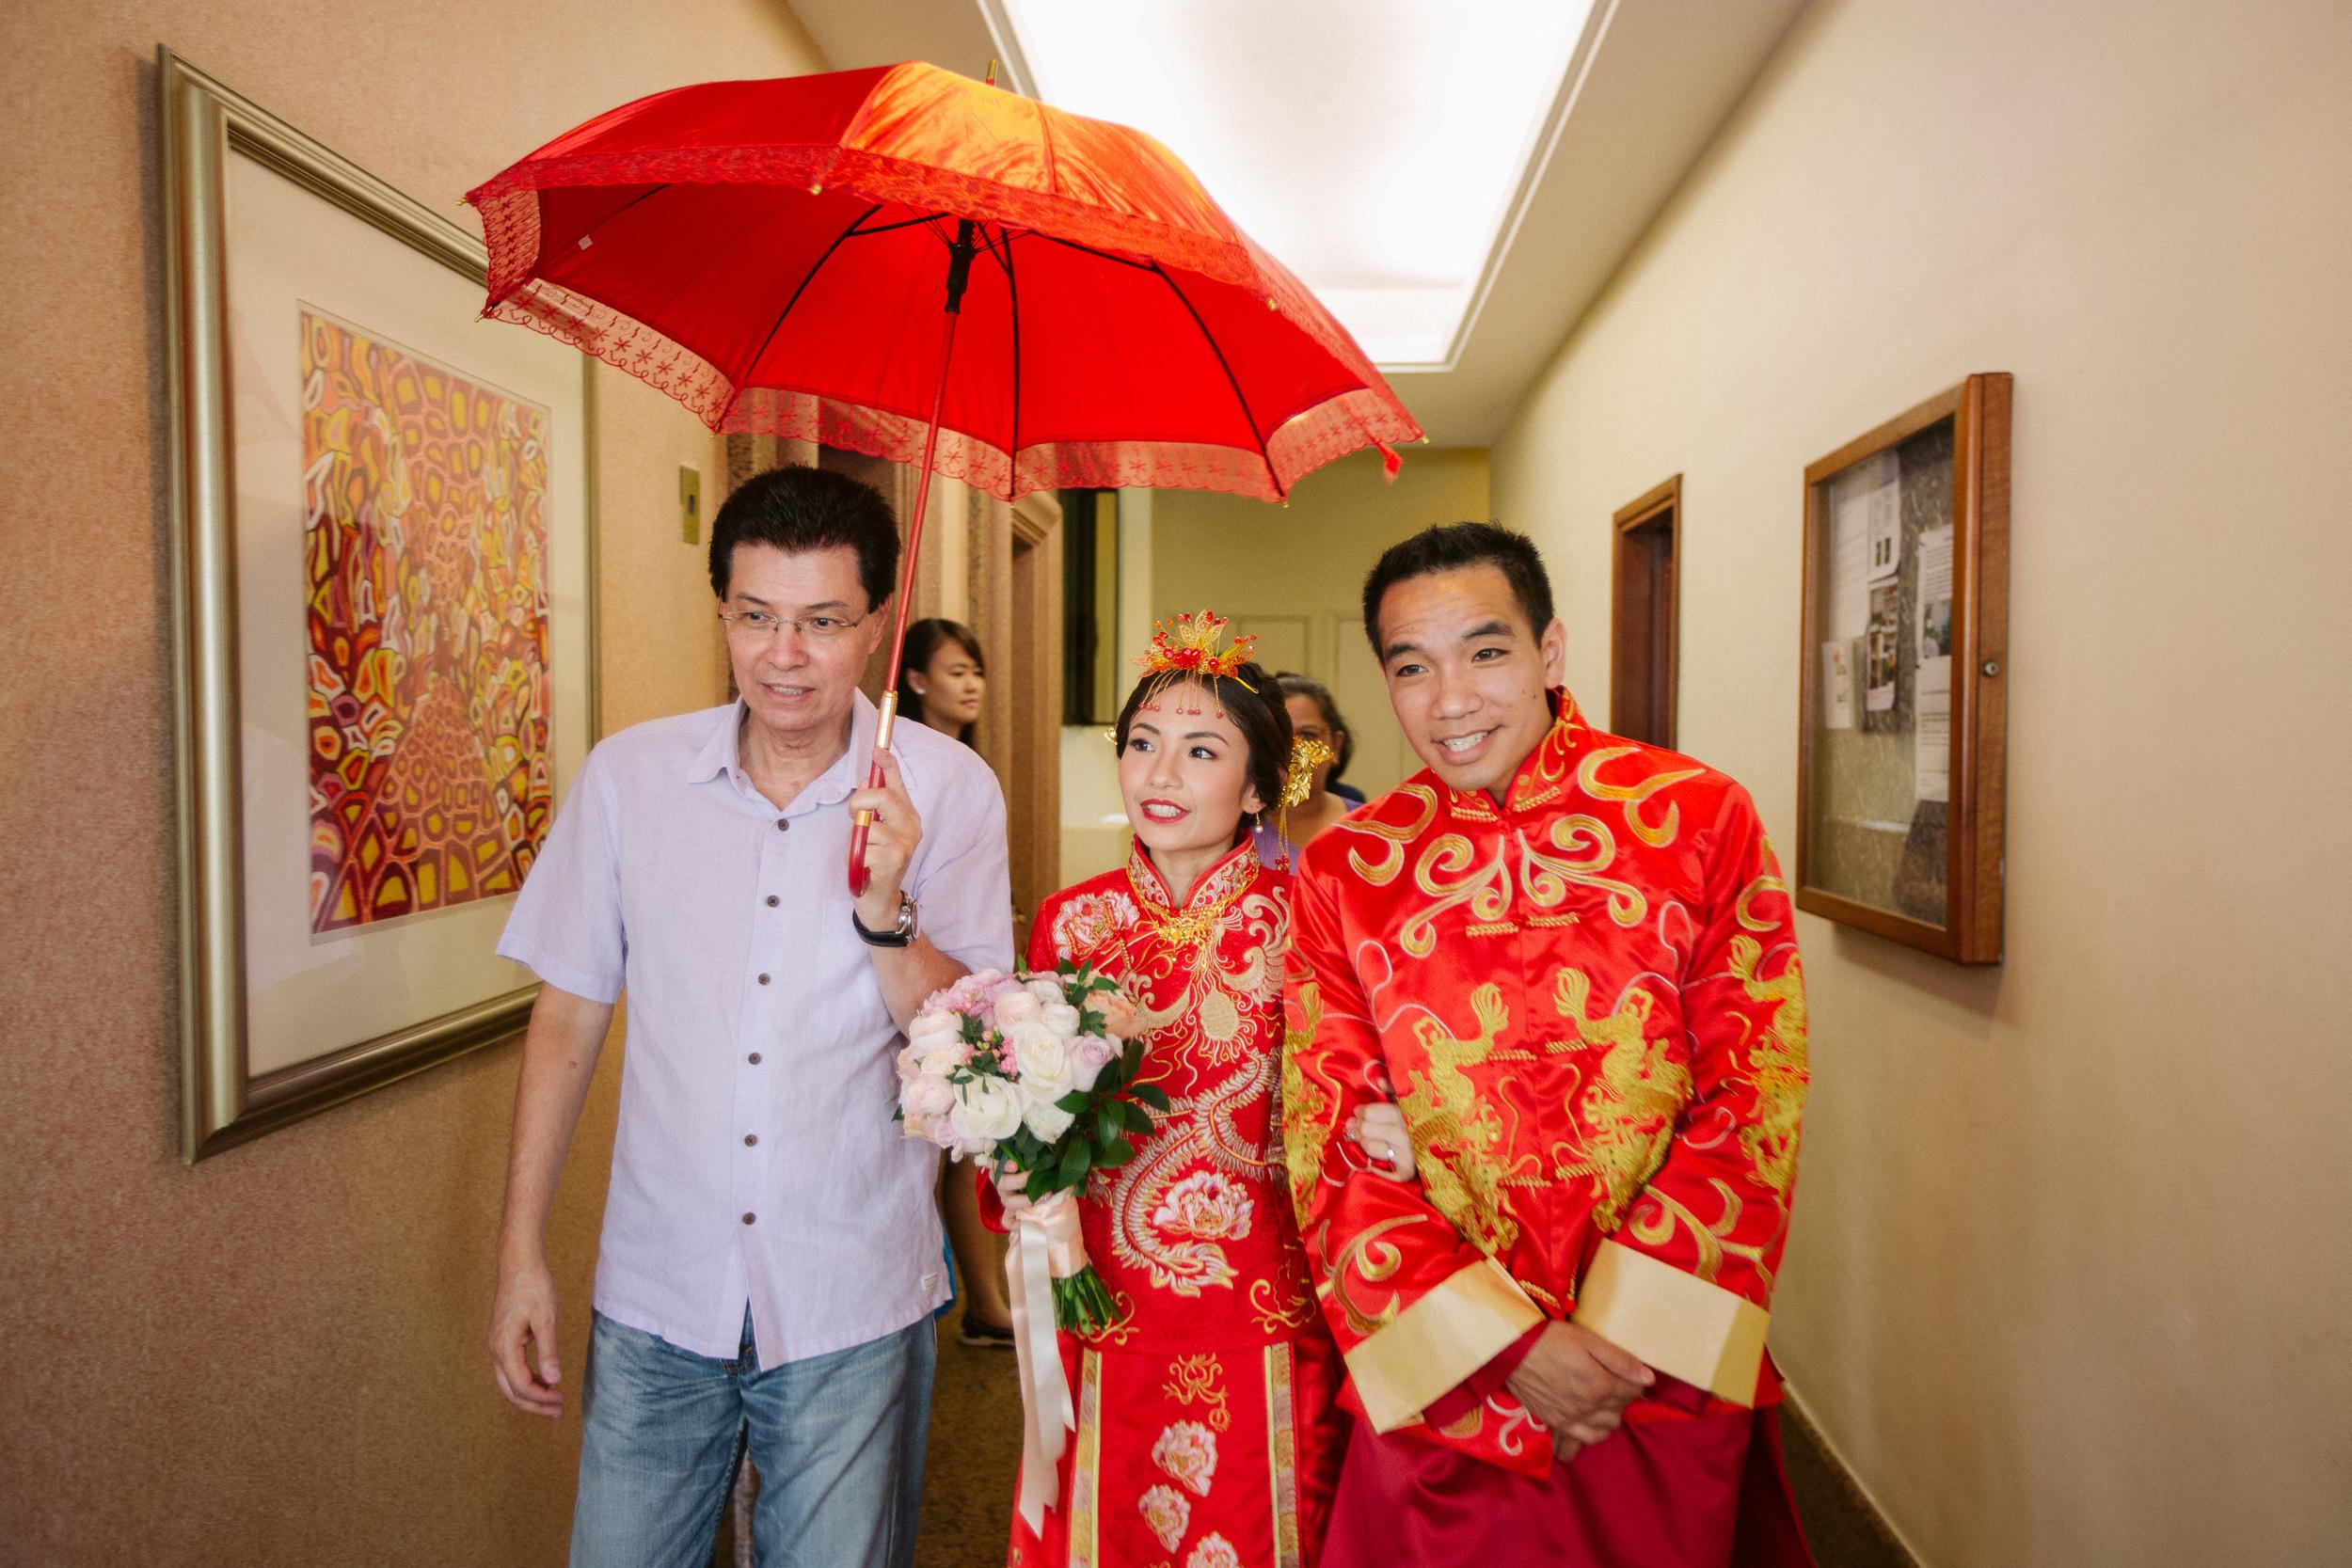 singapore-wedding-photographer-cheryl-matthew-fullerton-hotel-wedding-32.jpg